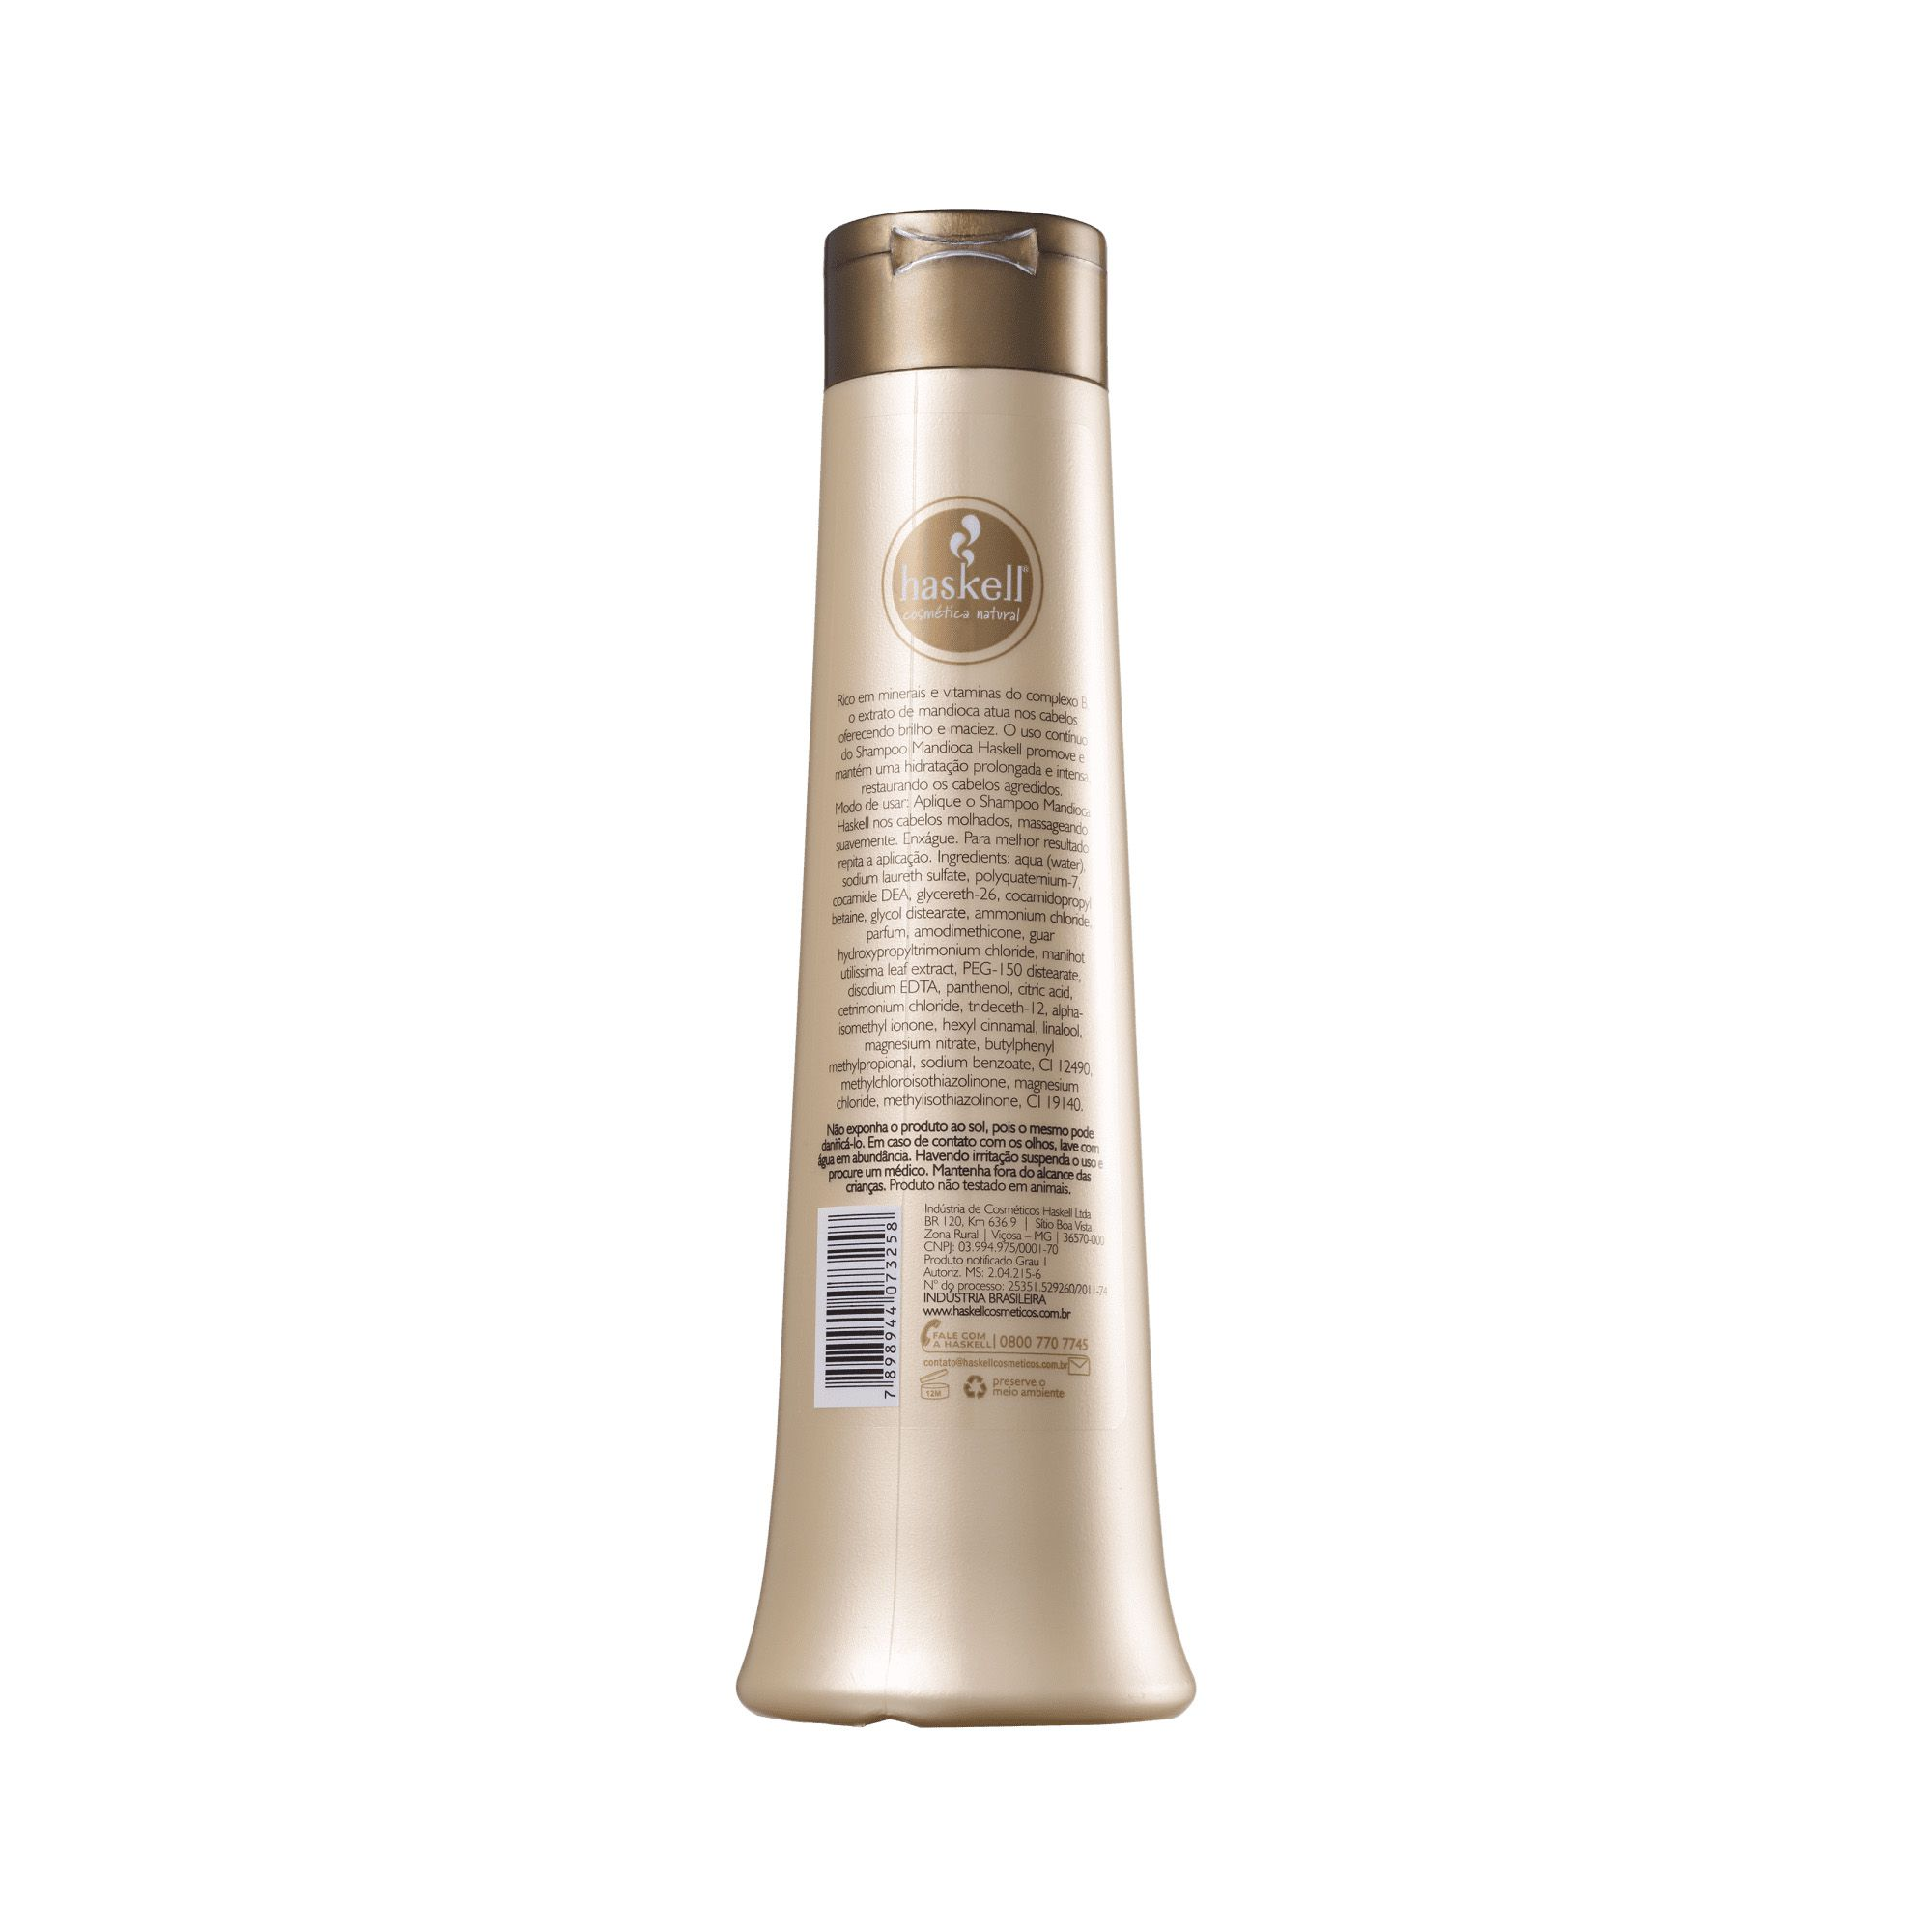 Shampoo Mandioca 500ml - Haskell